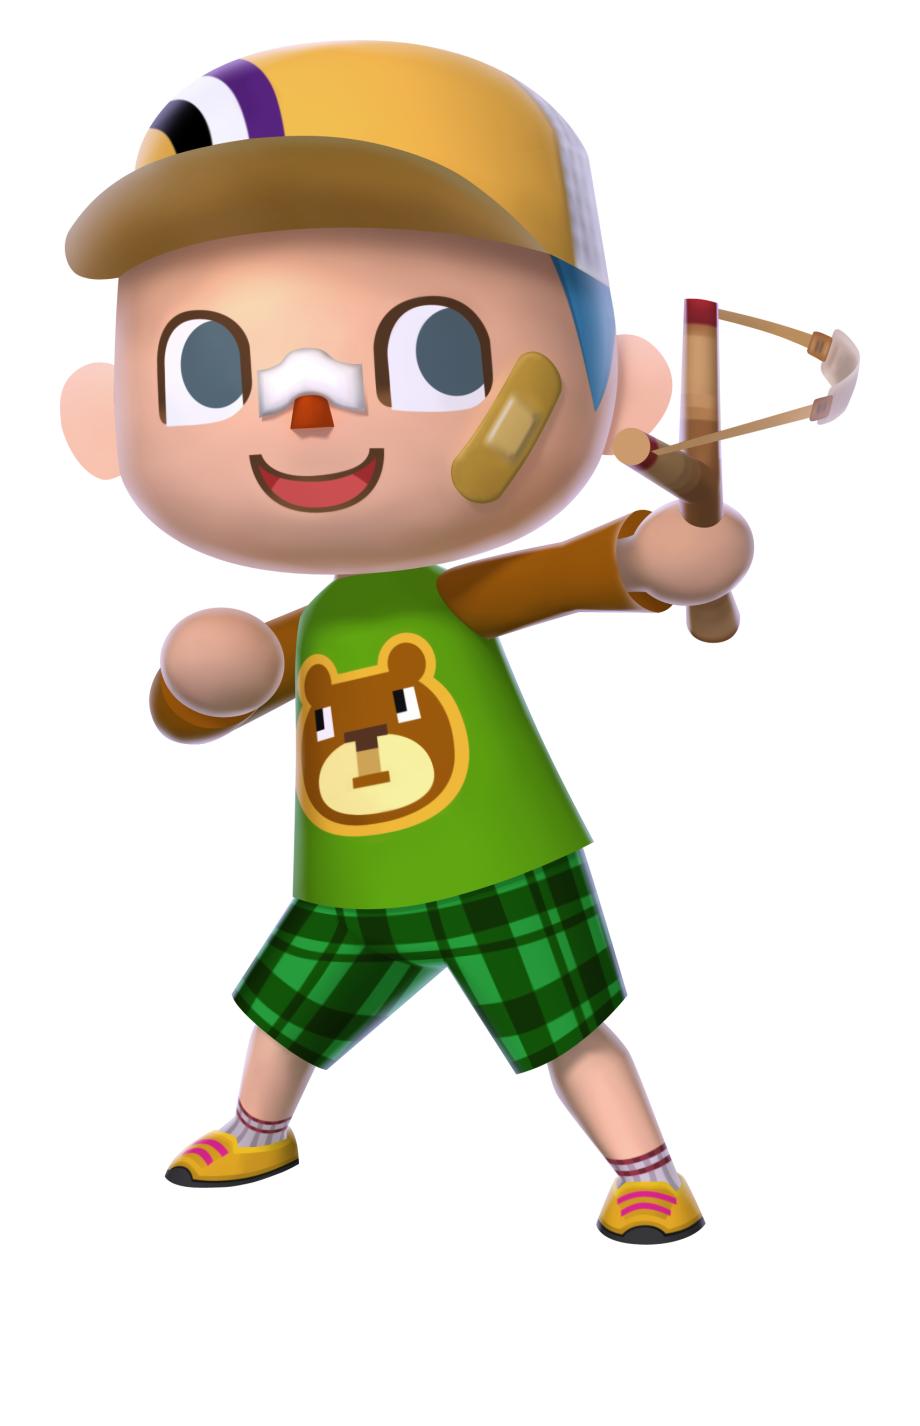 Png Royalty Free Boy Transparent Animal Crossing Animal